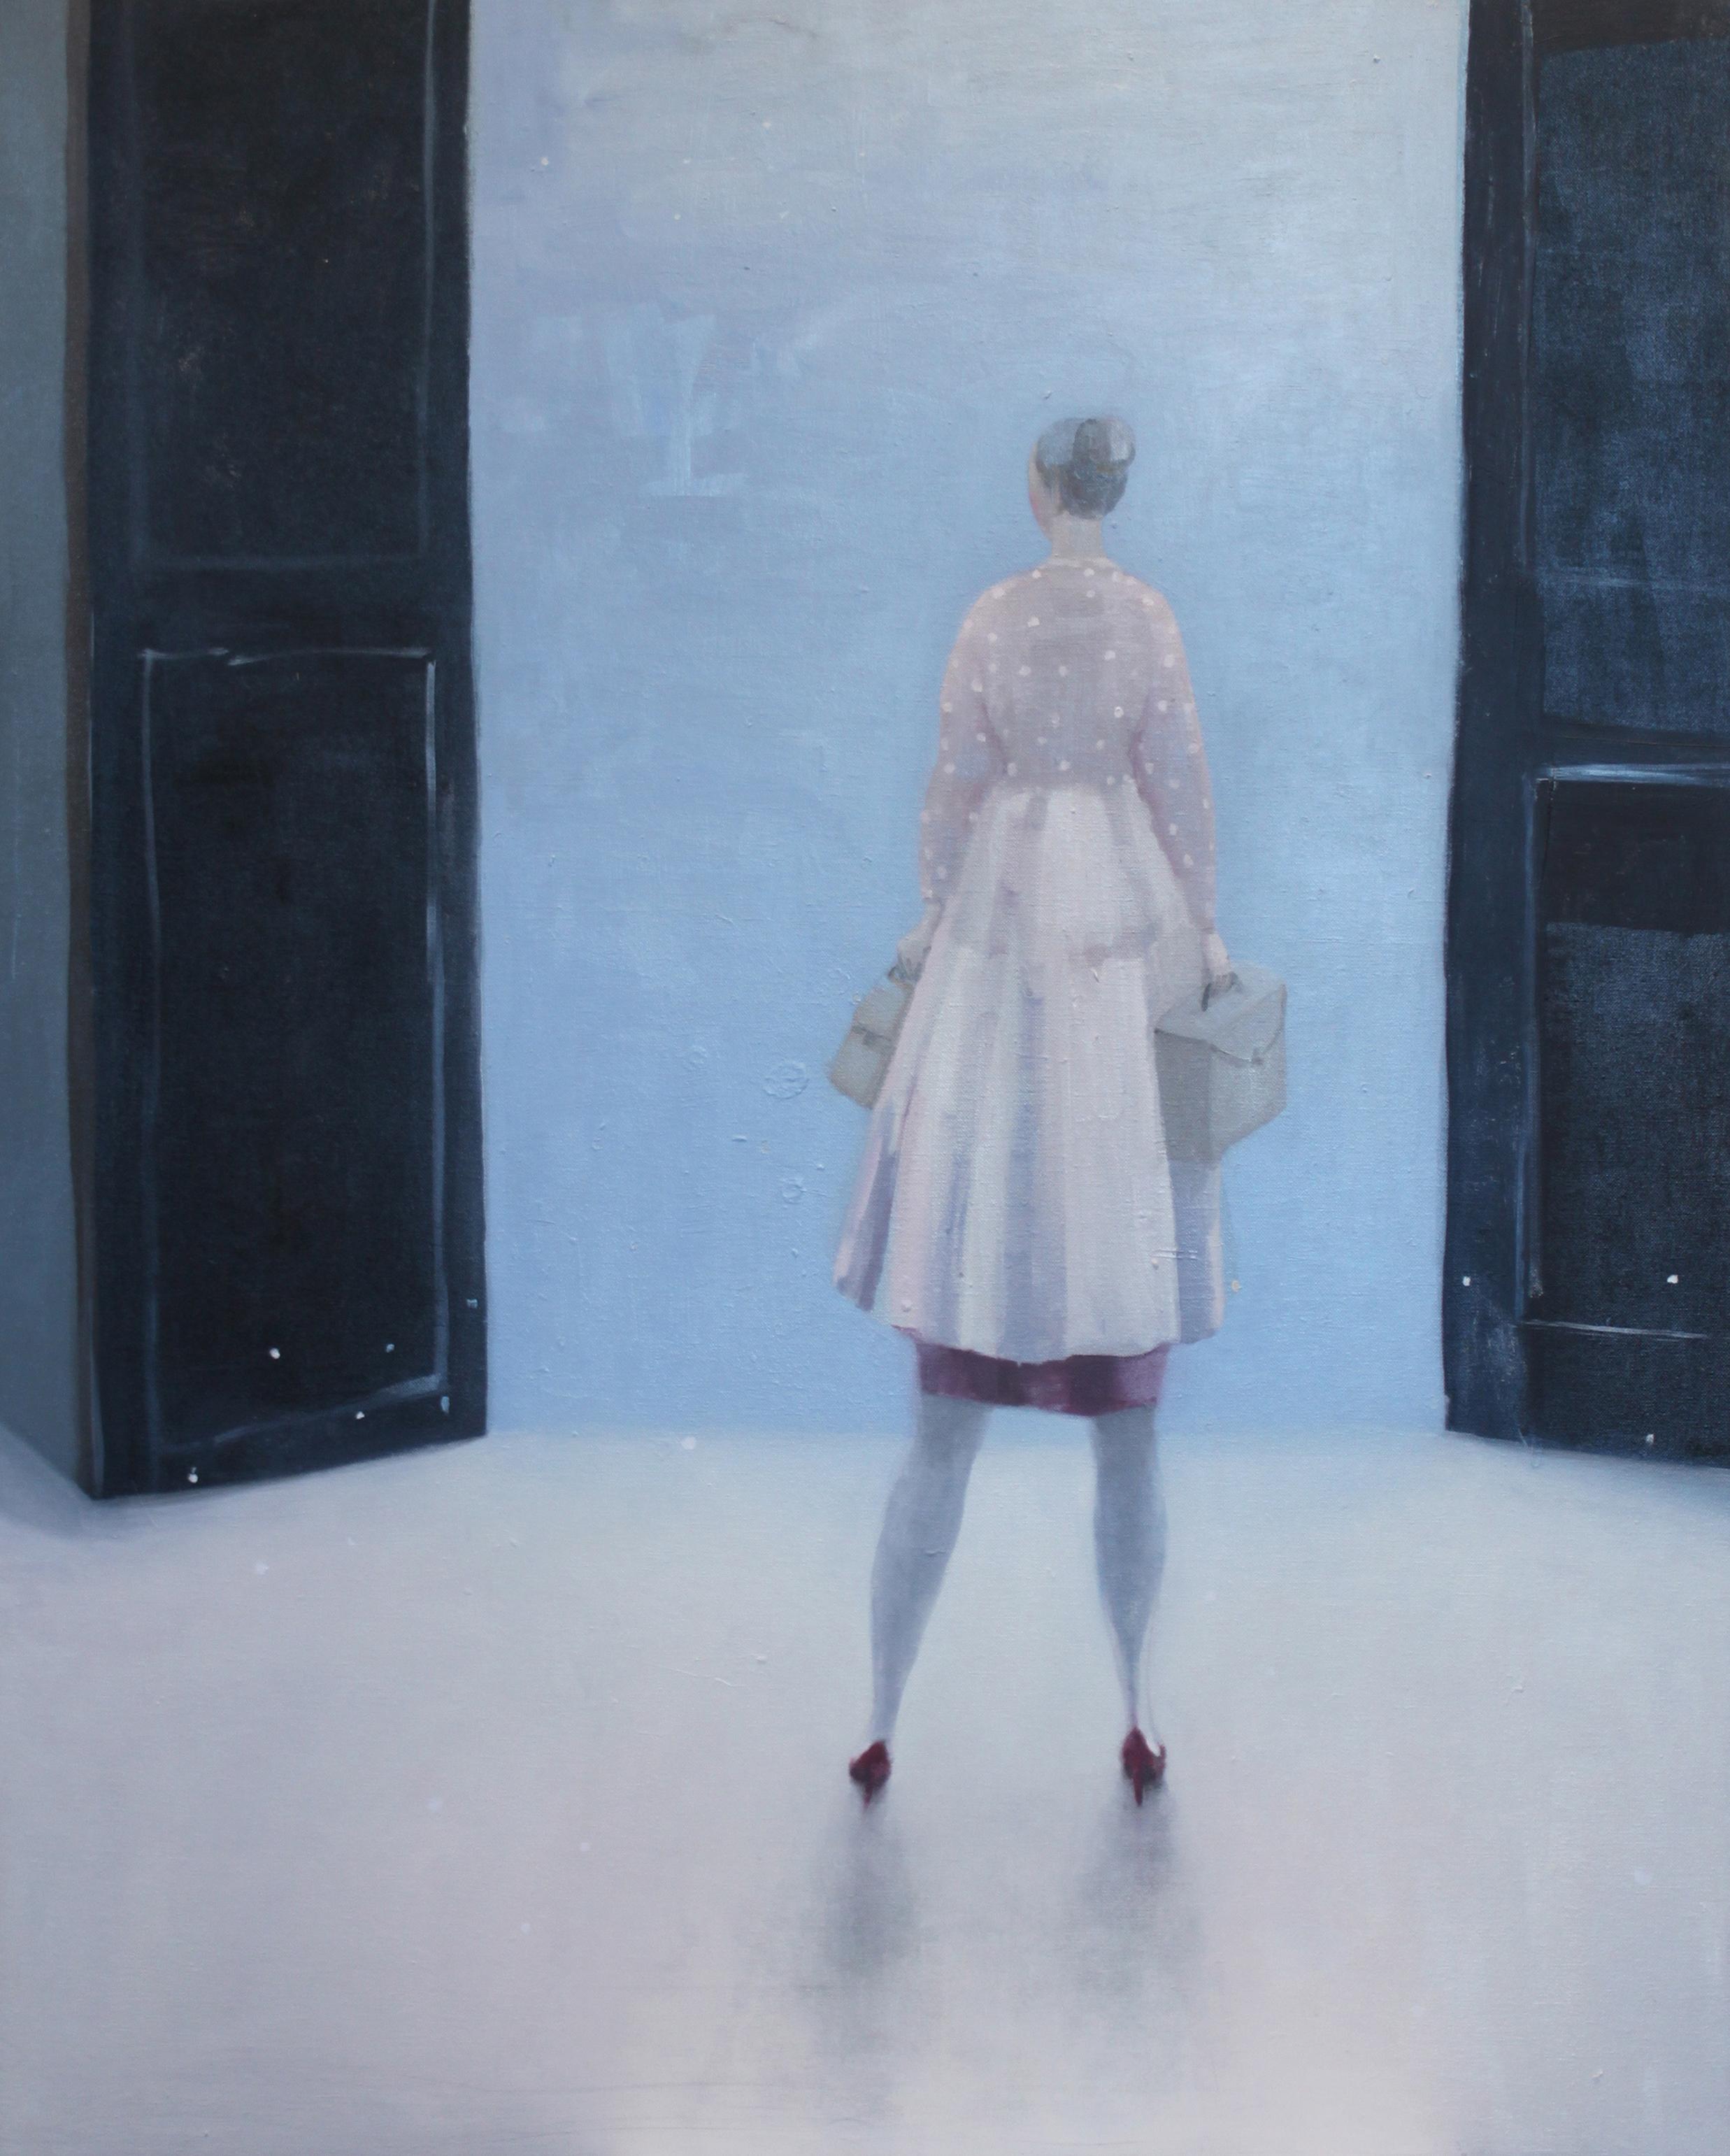 K r i s t i n V e s t g a r d  Leaving Footprints 80 x 100 cm oil on canvas £ 3800